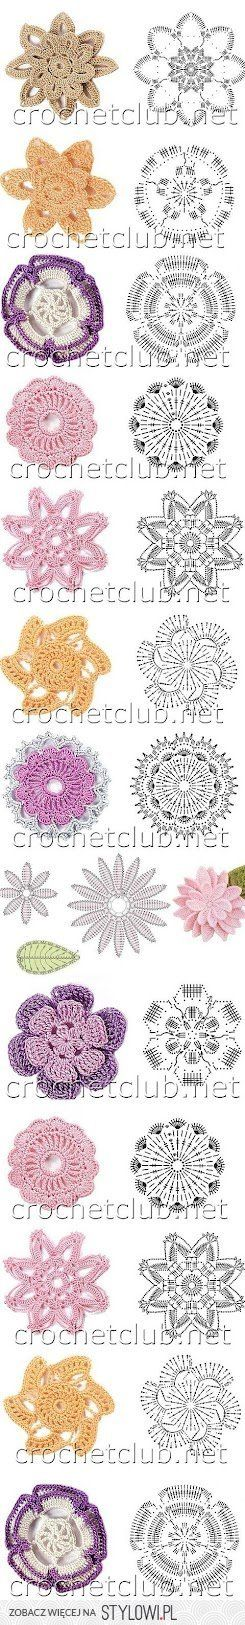 Receitas de Crochet on Stylowi.pl